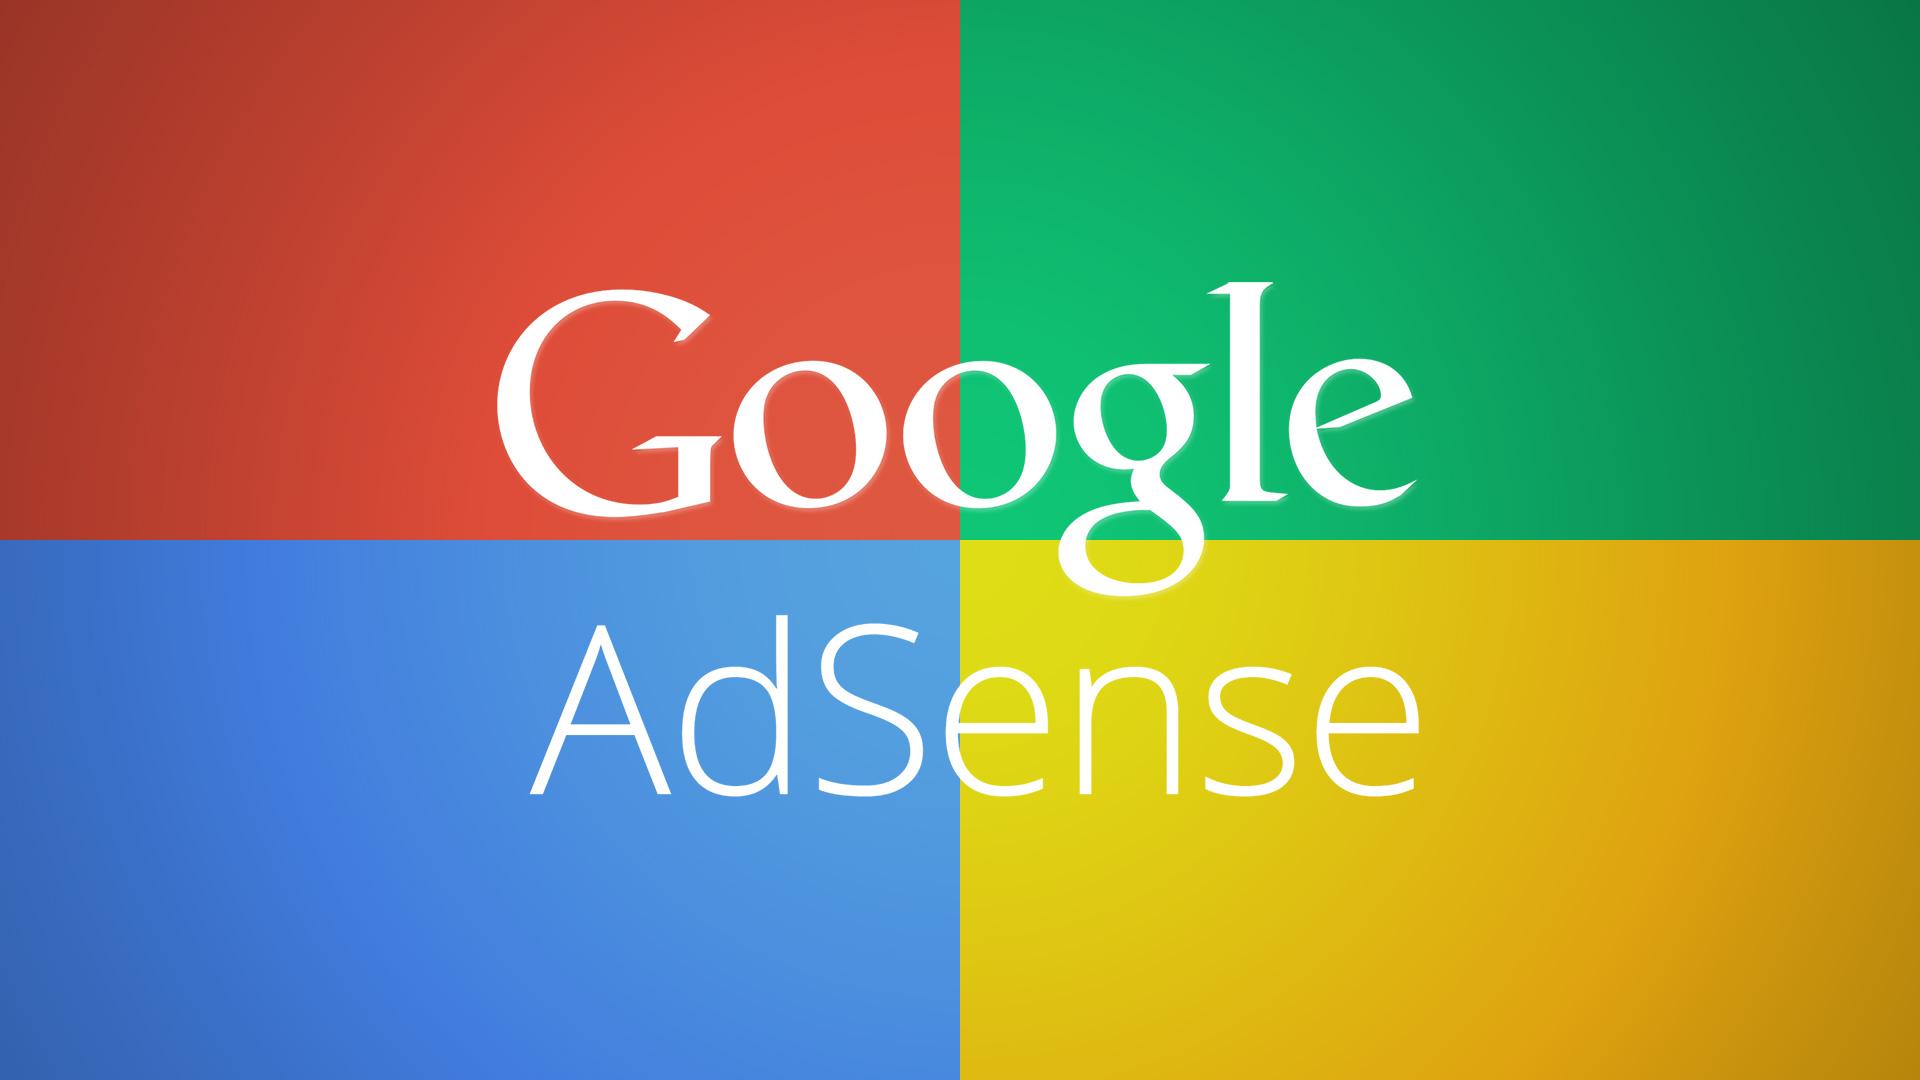 Google Adsense,идея,заработок,бизнес каталог компаний homebusiness.kz,идеи бизнеса,раскрутка бизнеса,объявления,каталог сайтов бизнес,бизнес портал,домашний бизнес